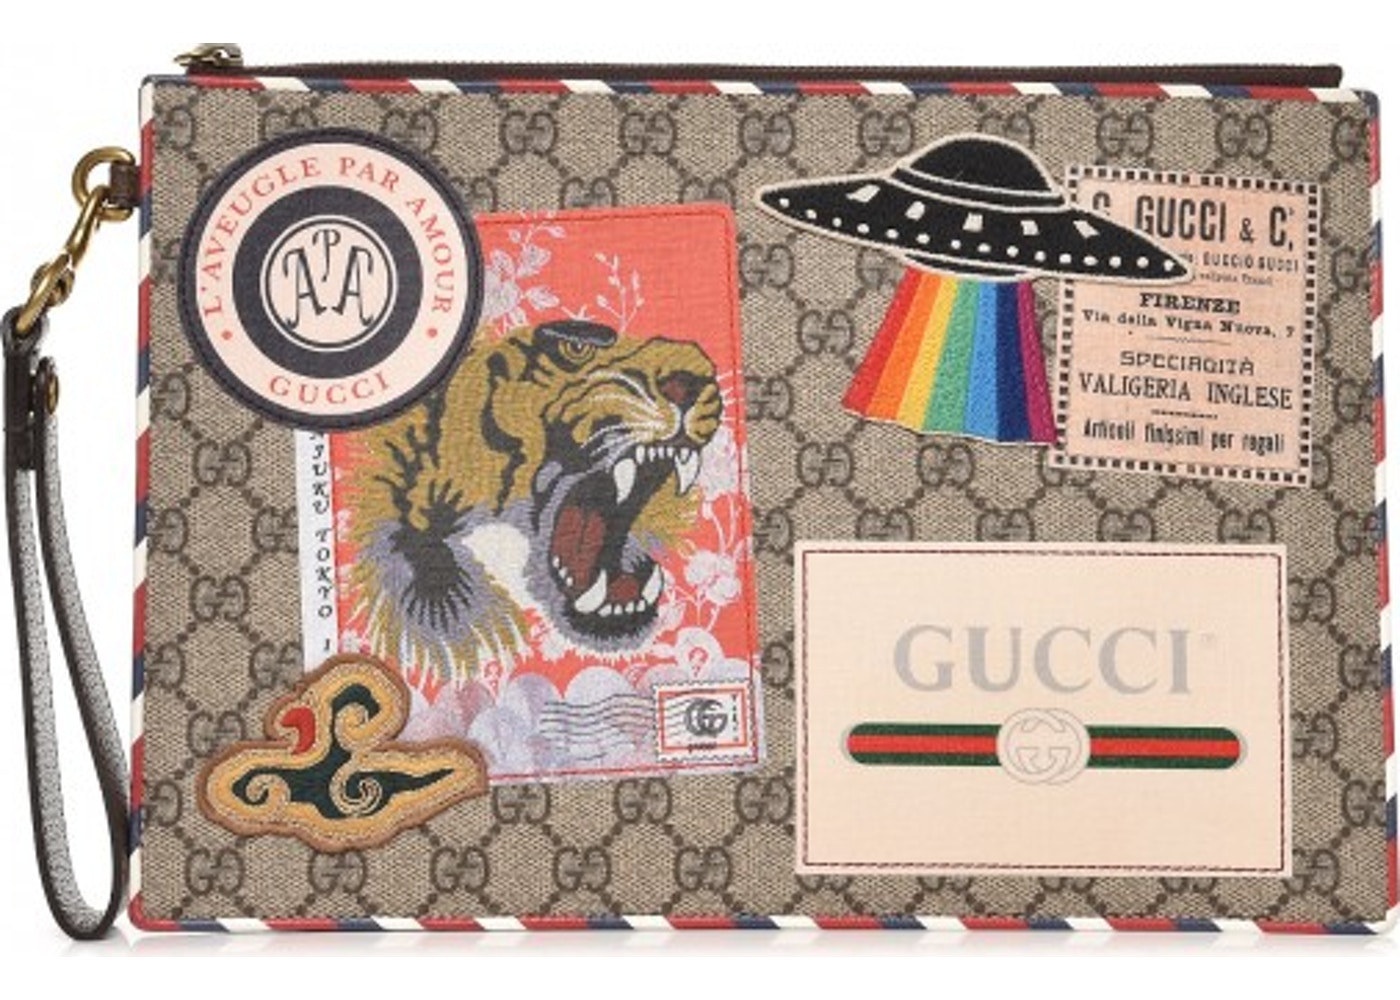 8c1b7f6b6 Gucci Zip Pouch Monogram GG Supreme Courrier Beige/Ebony